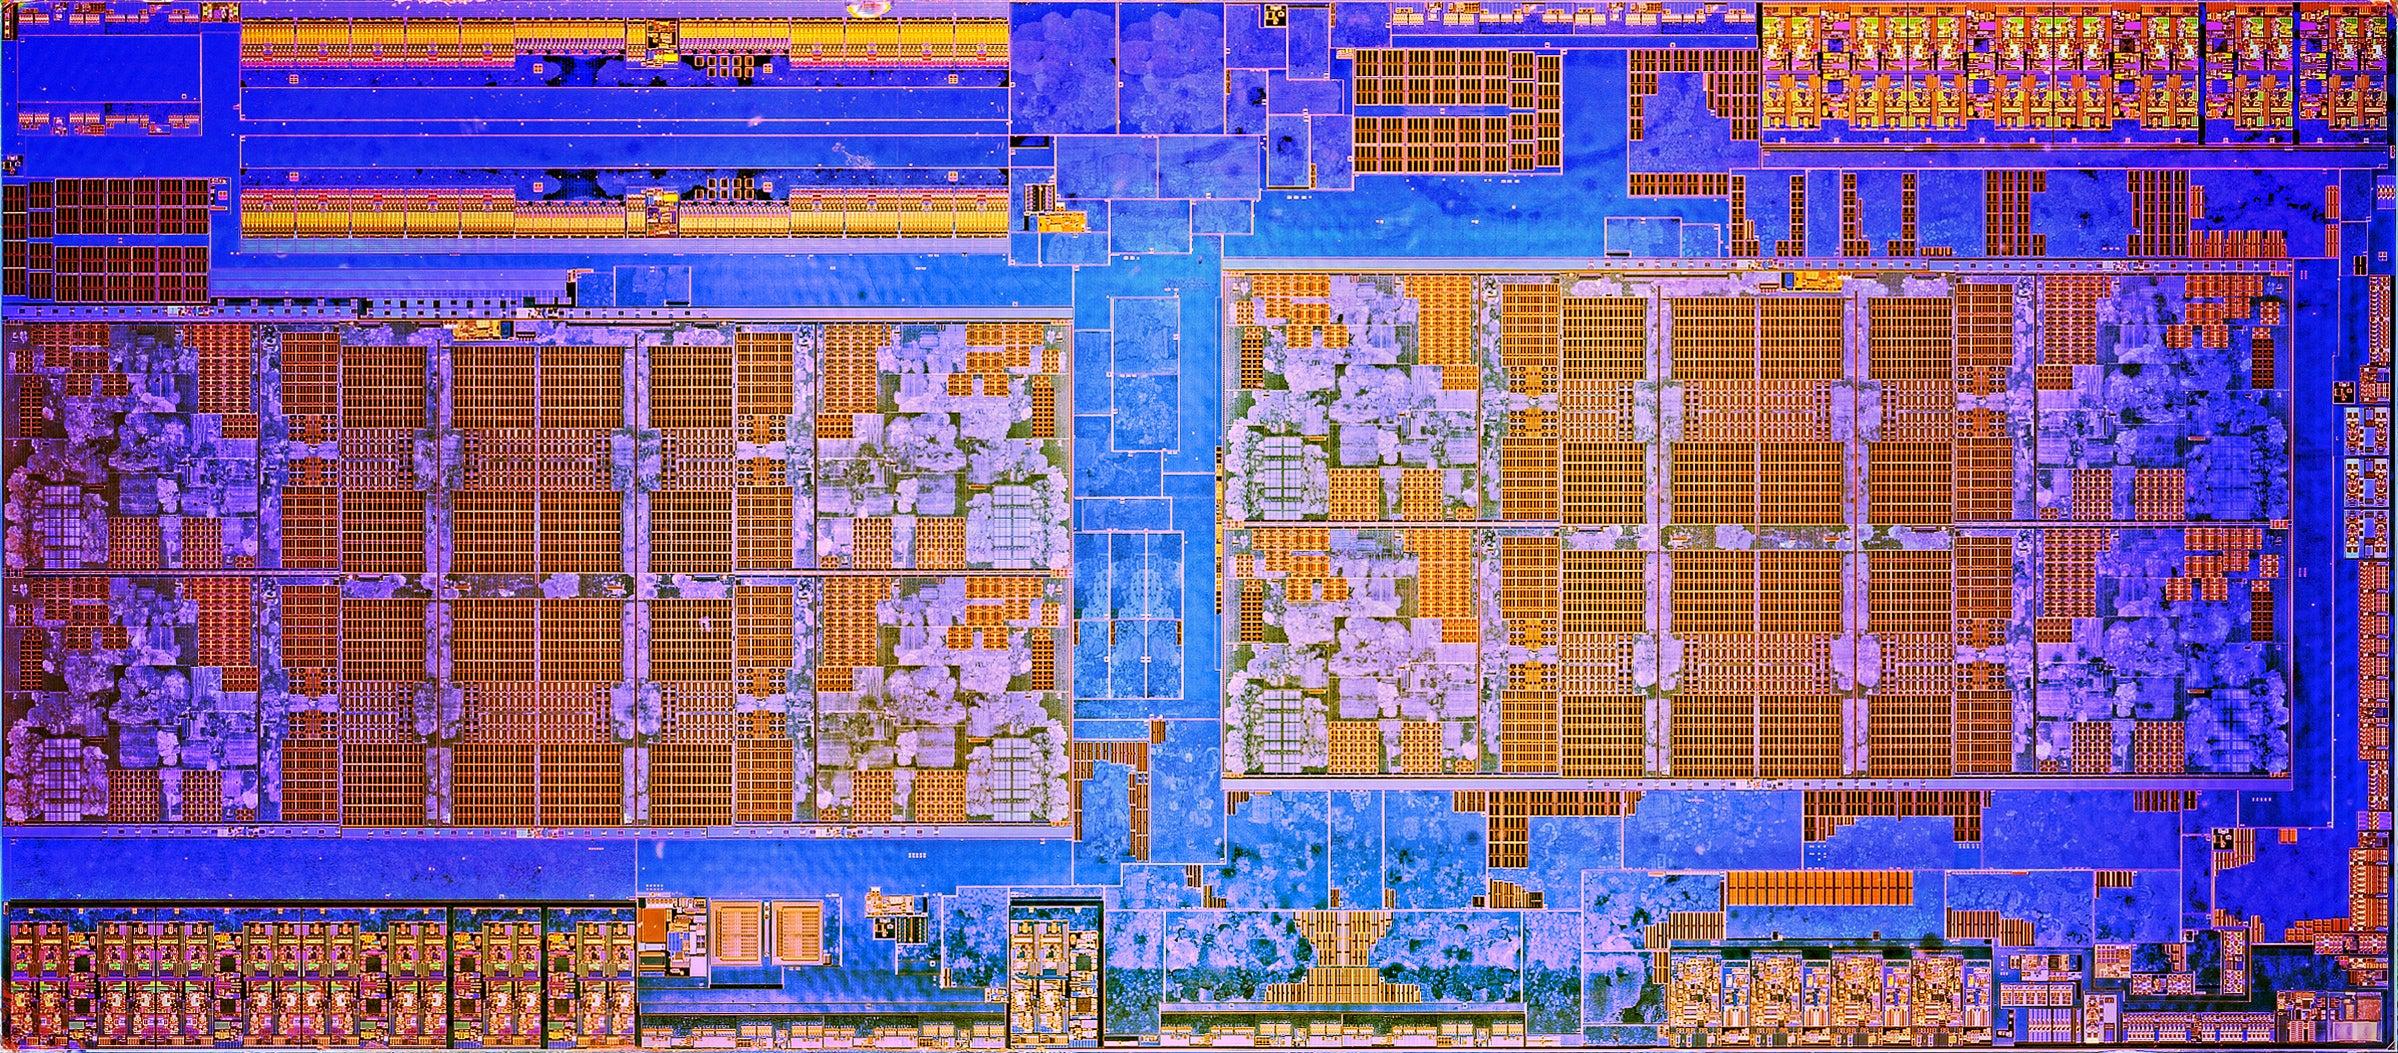 Ryzen Threadripper review: We test AMD's monster 1950X CPU   PCWorld